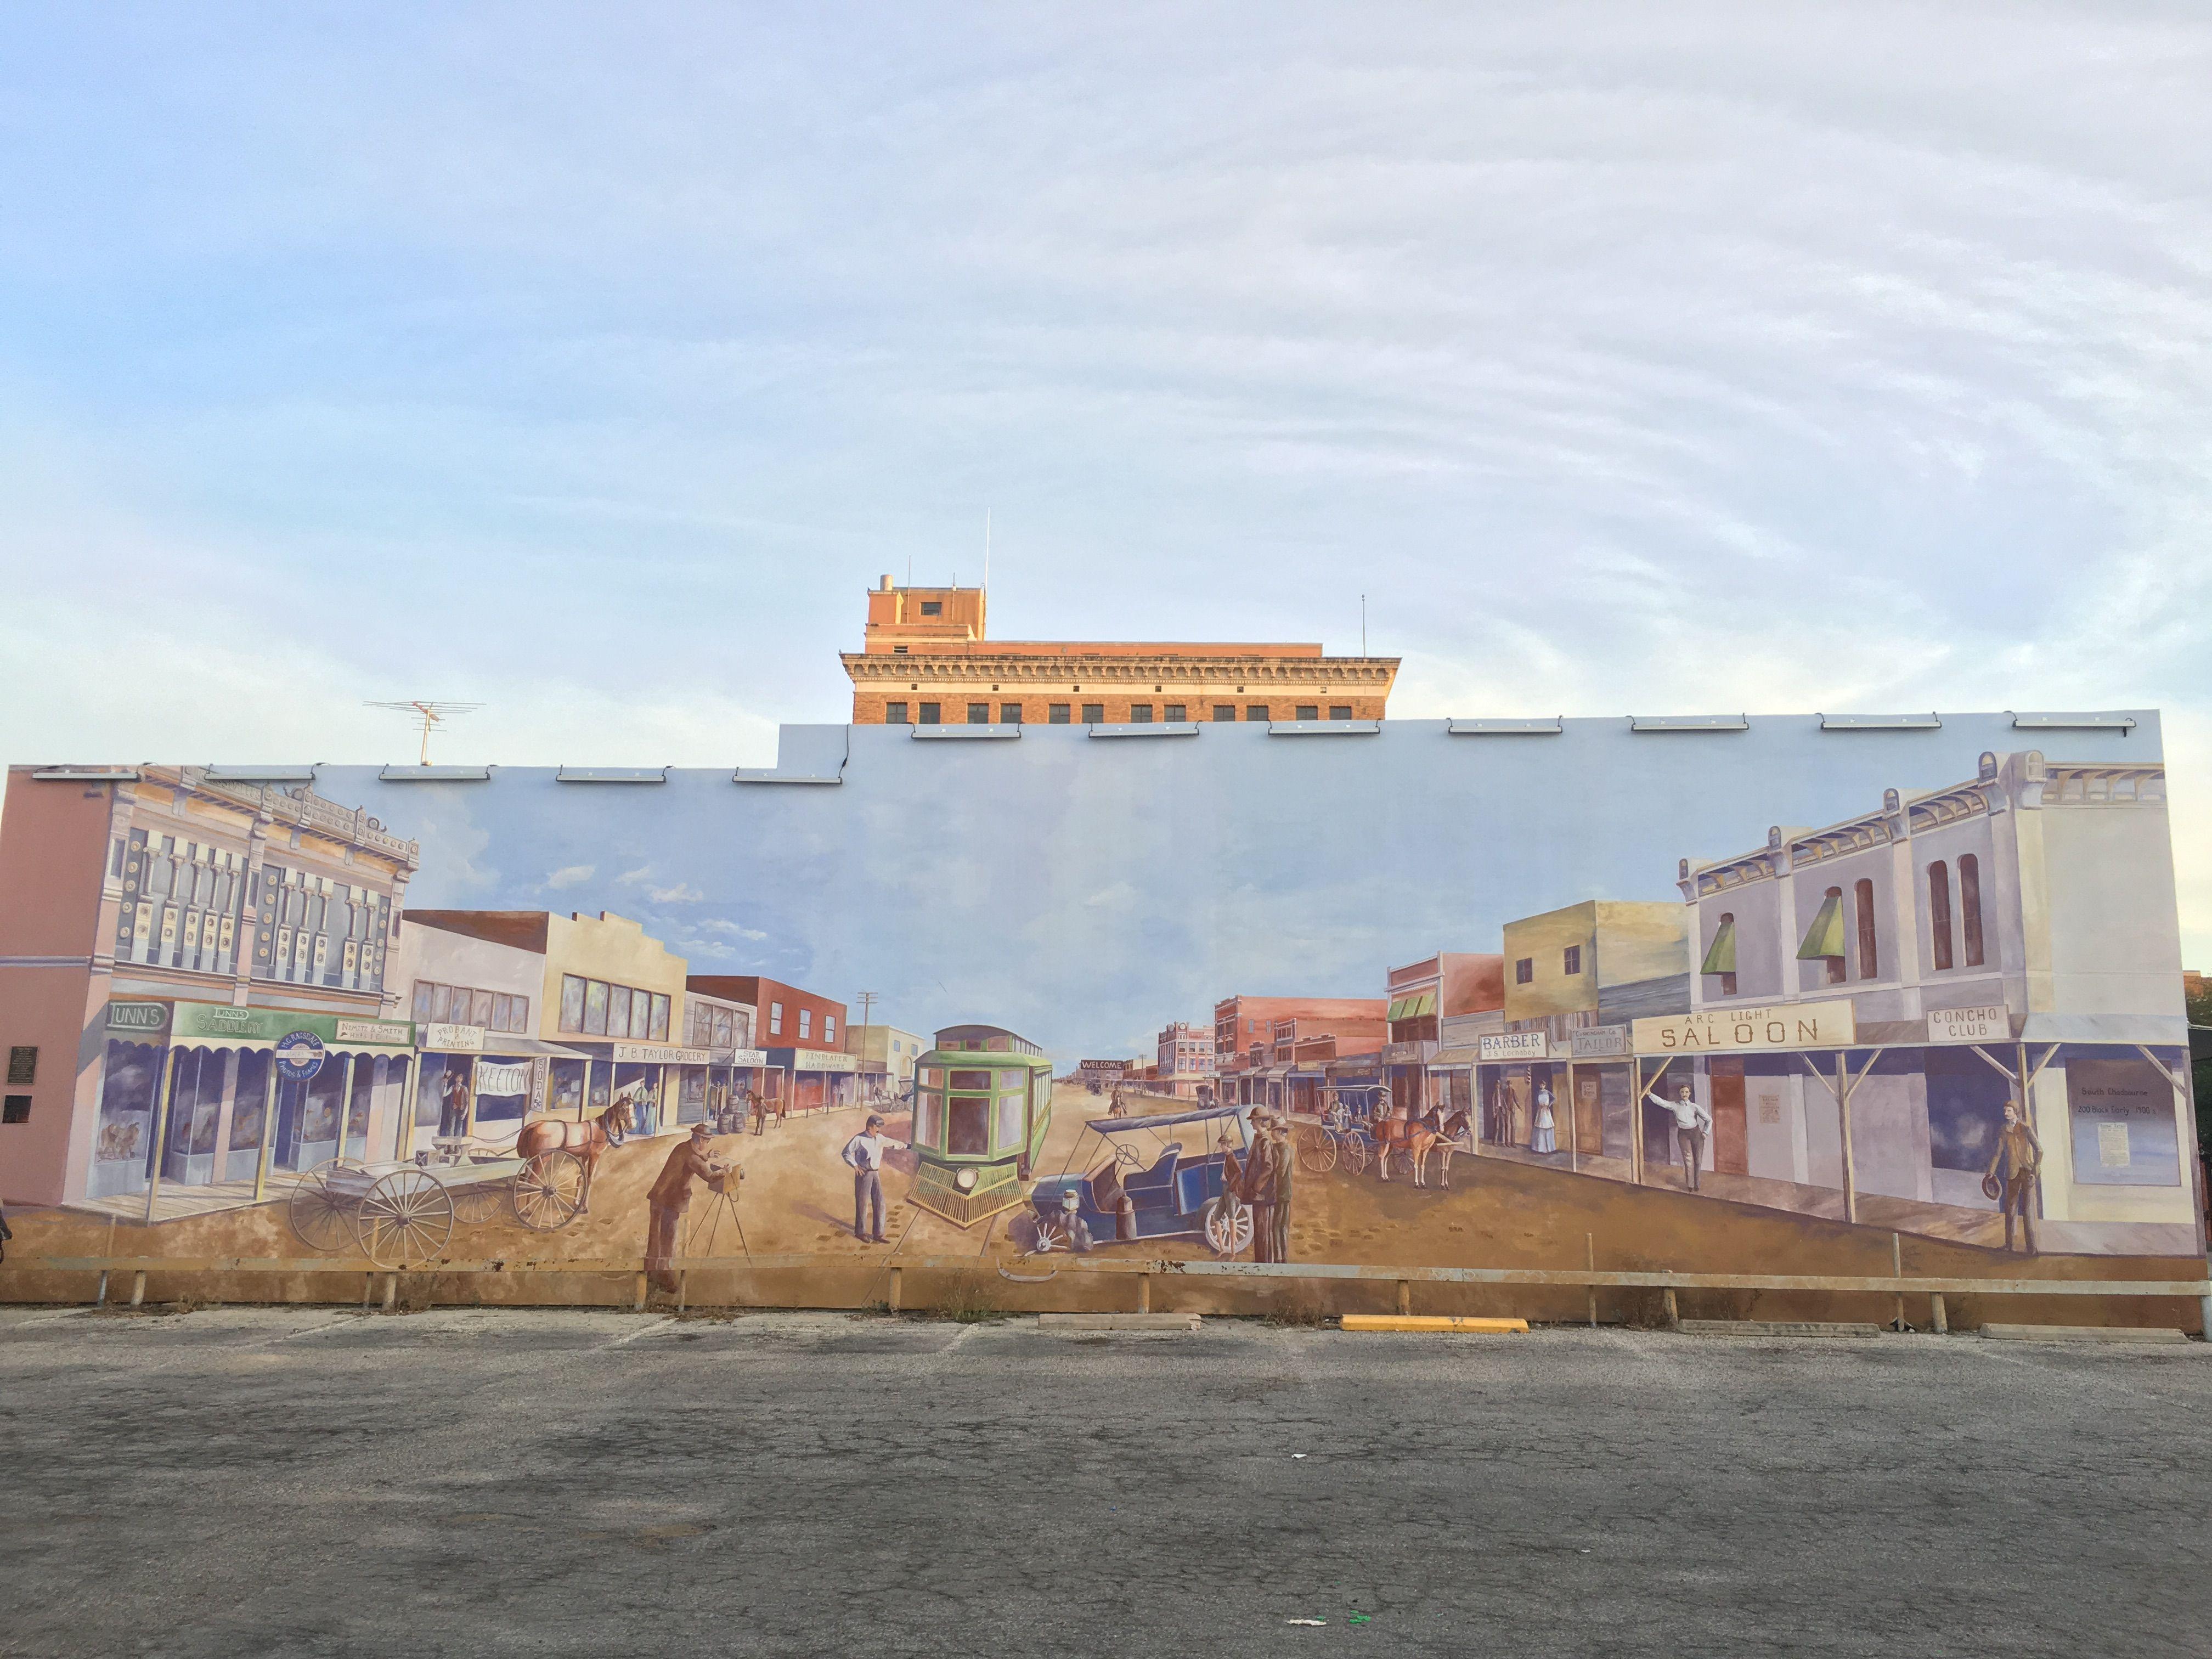 Chadbourne St Mural In San Angelo Texas San Angelo San Mural